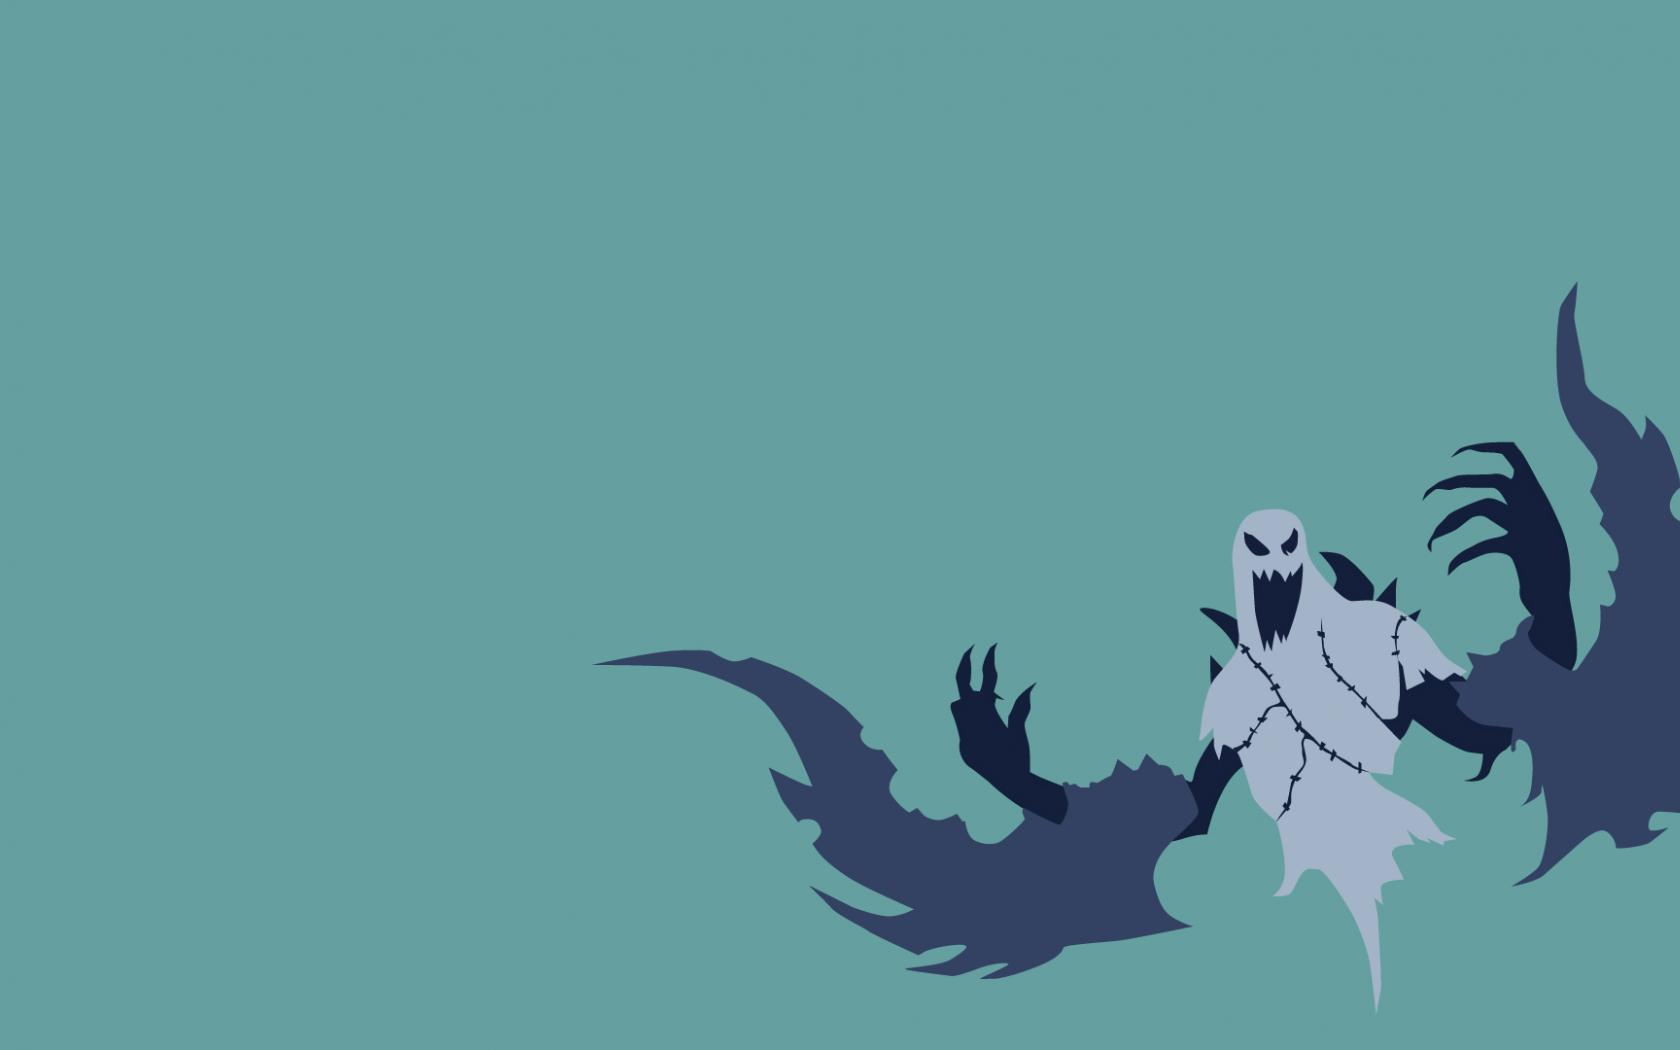 Free Download Haunted Nocturne Minimalistic Fan Art League Of